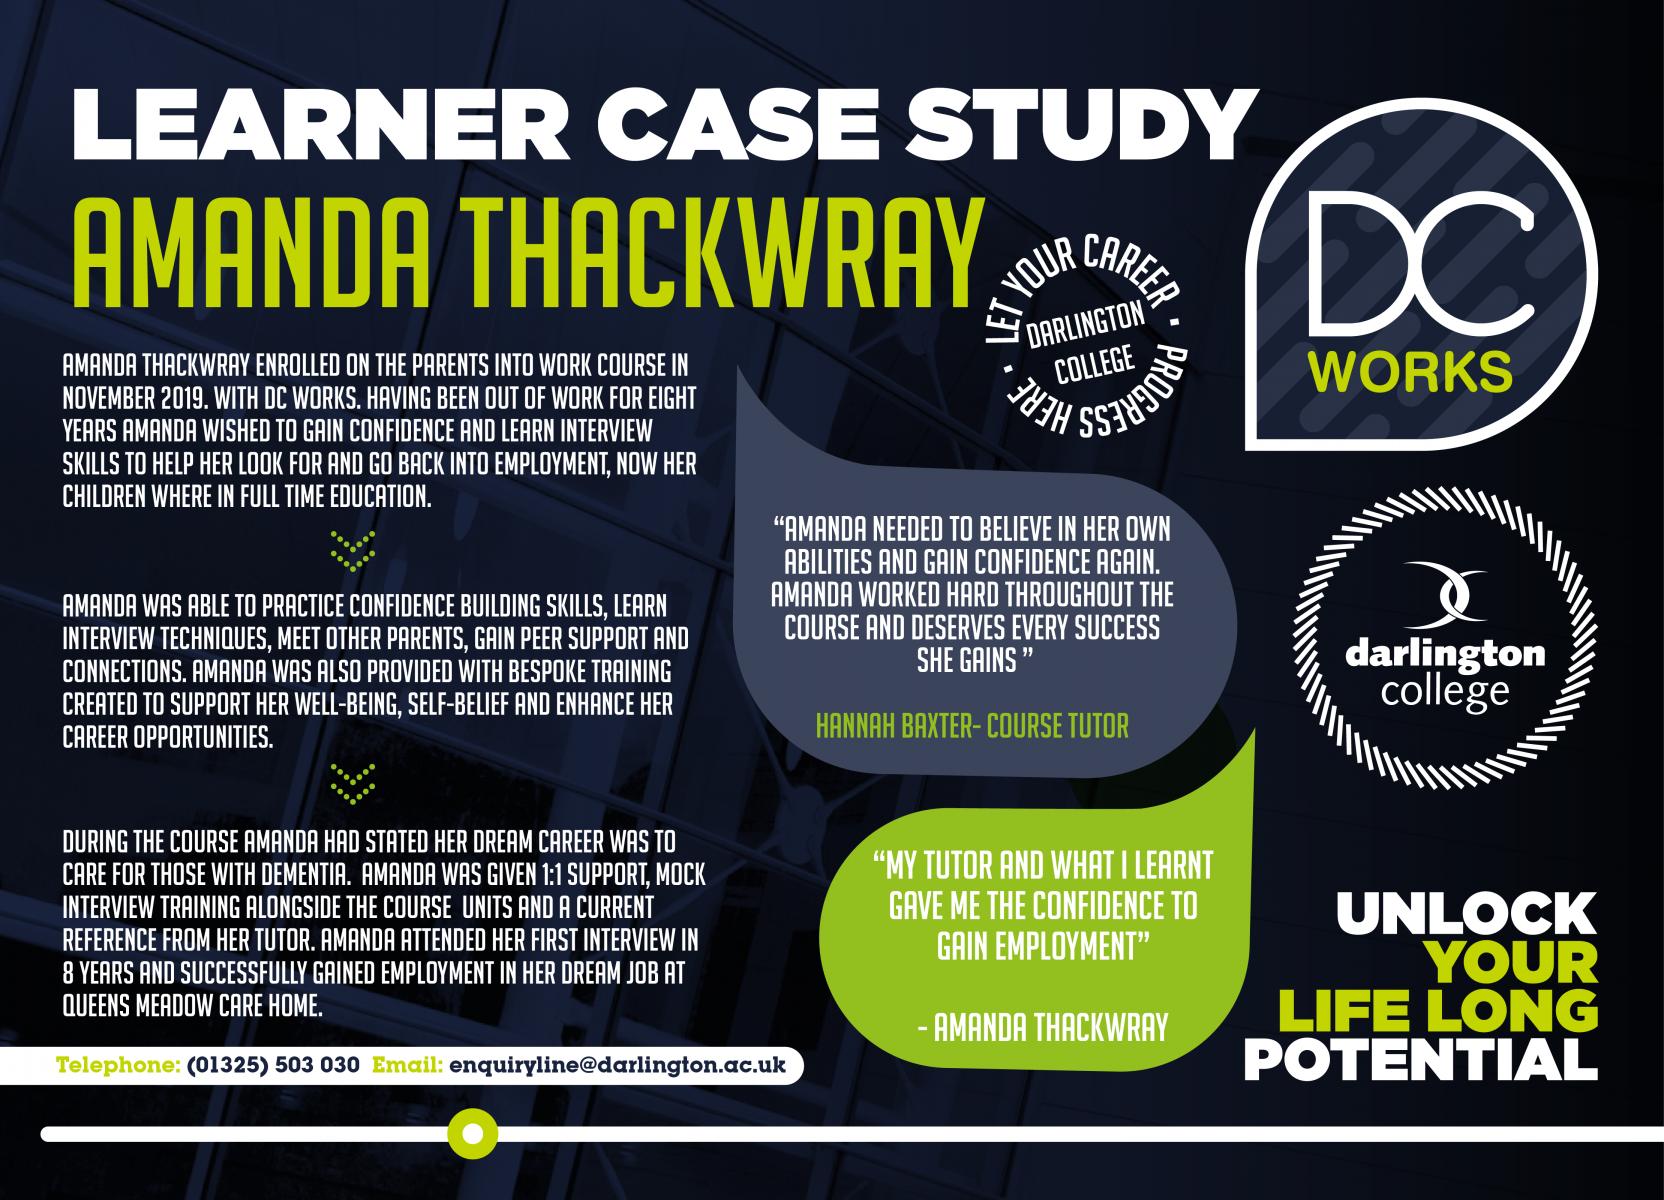 Amanda-Thackwray-Case-Study-2-01